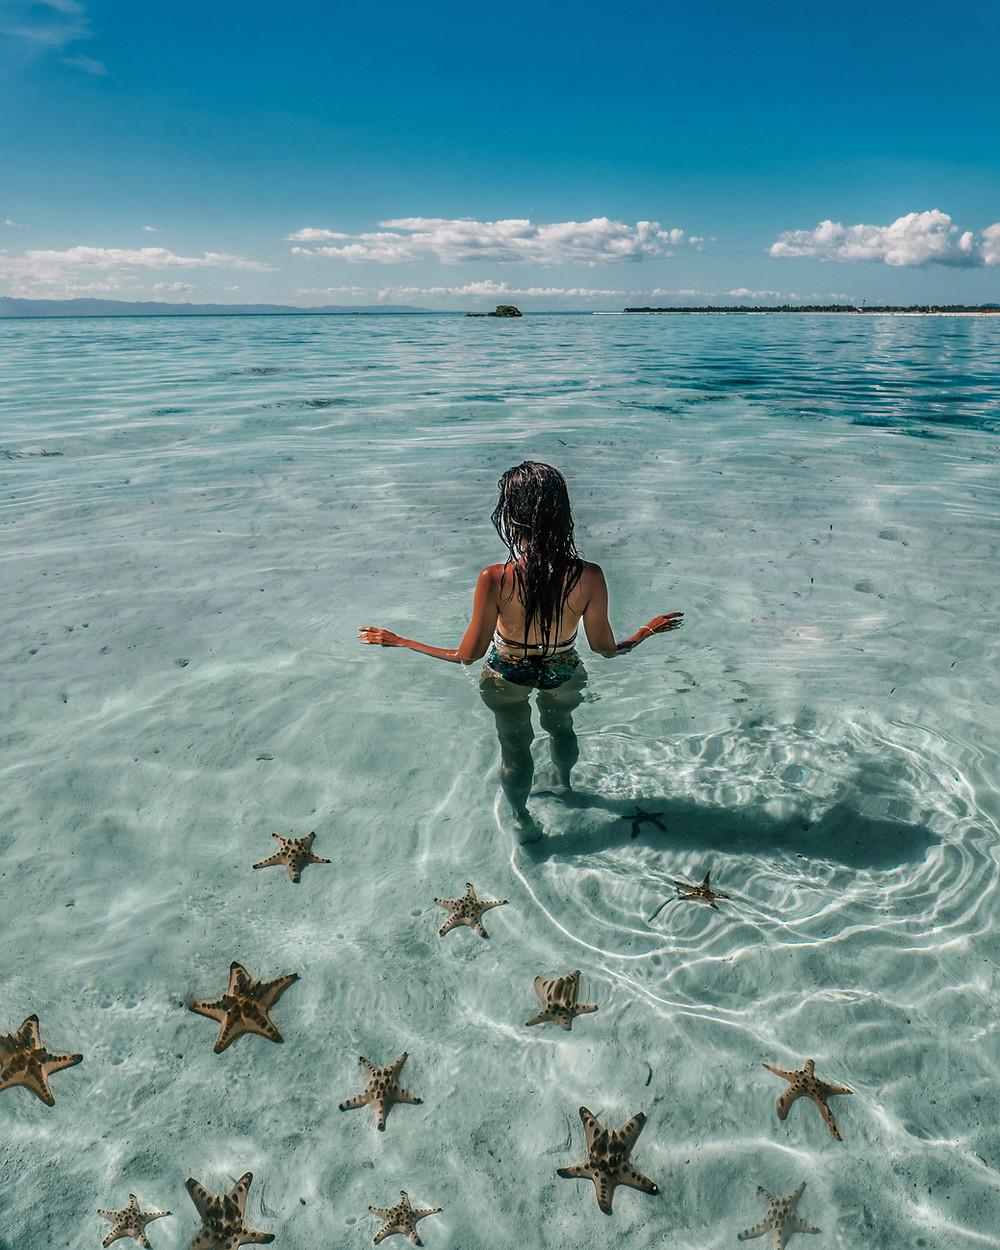 Virgin Island Sanbar, Panglao, The Philippines